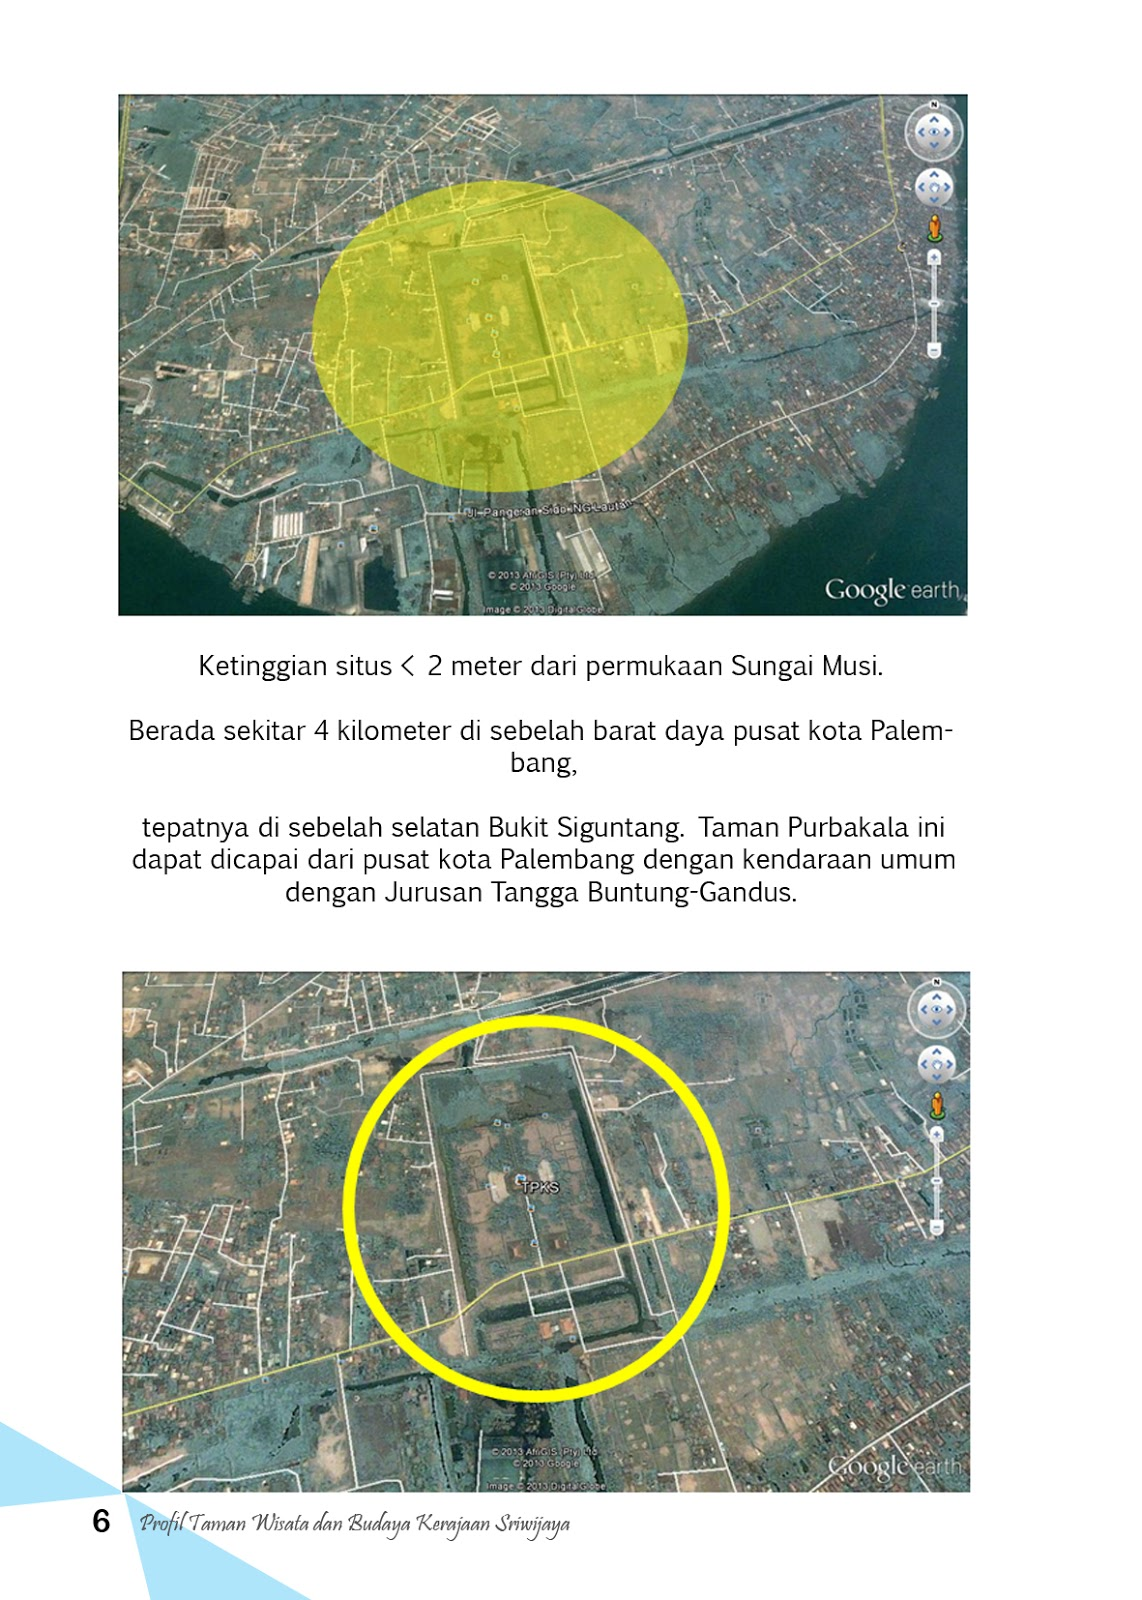 Museum Sriwijaya Situs Karang Anyar Terletak Kelurahan Anyyar Ilir Barat